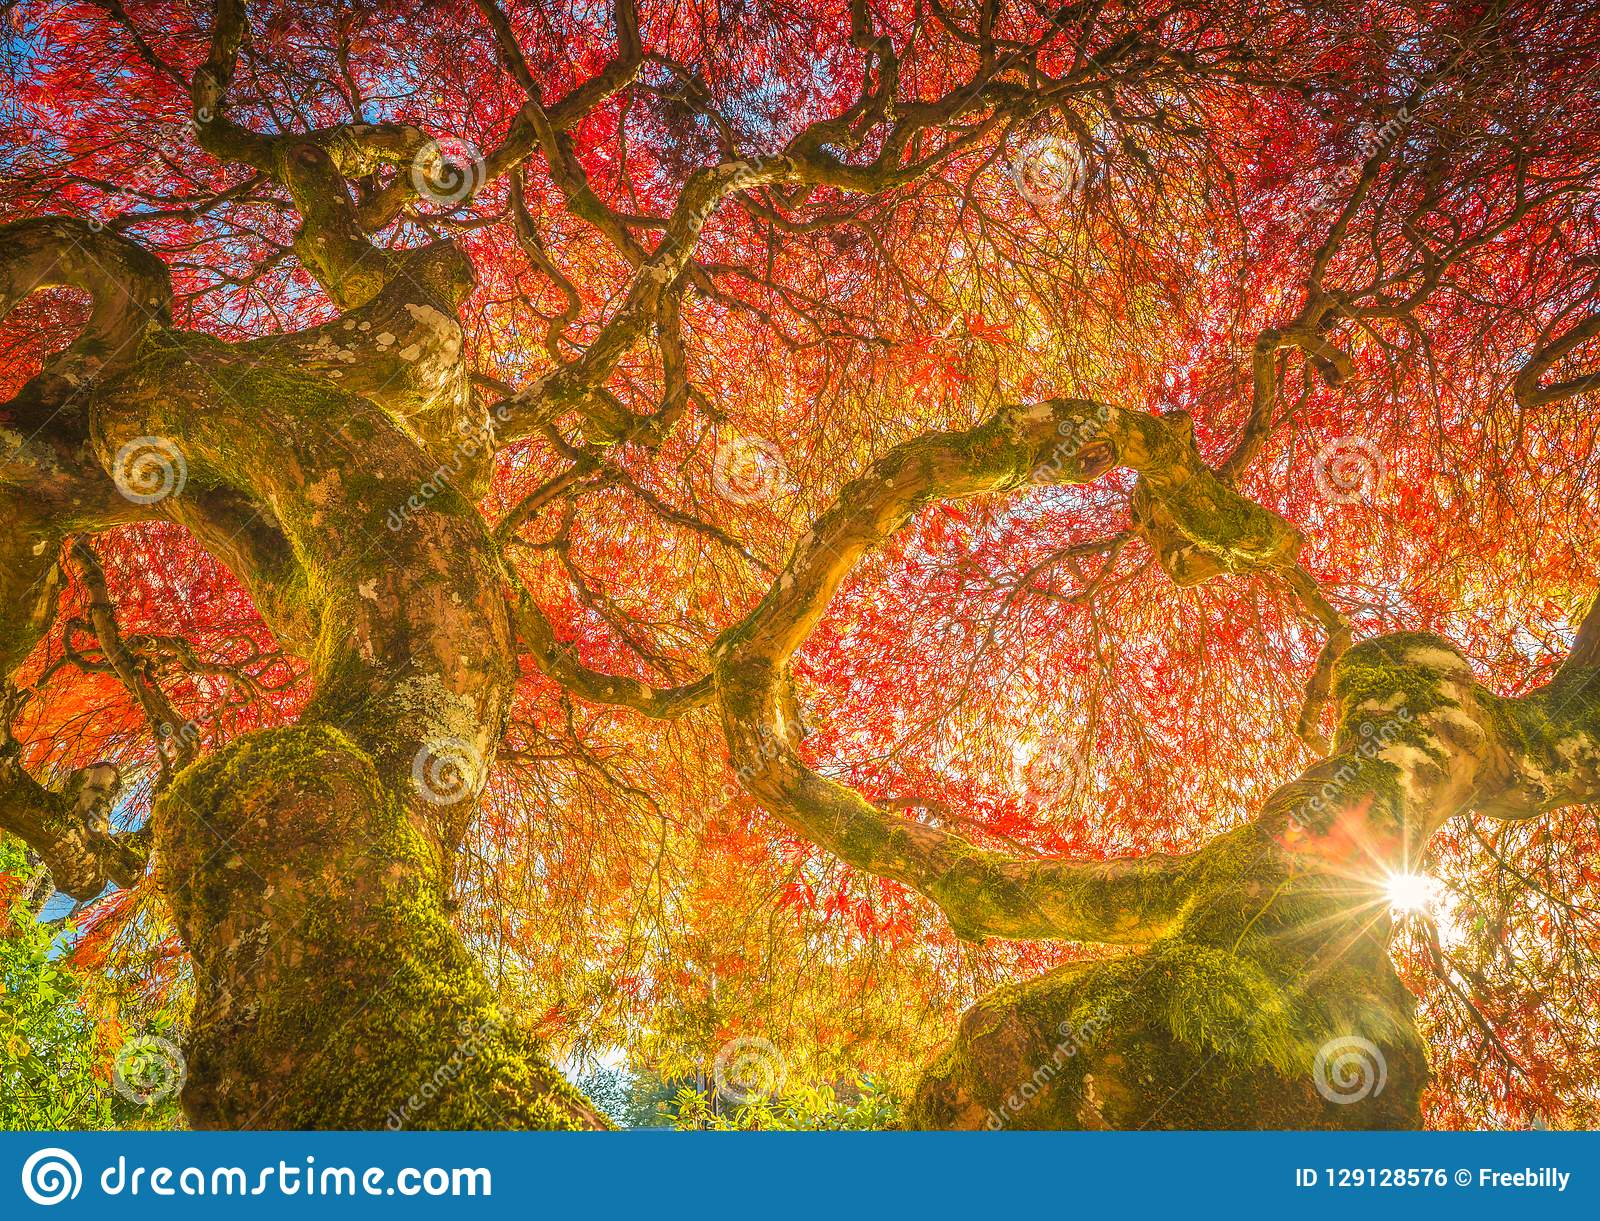 Century Japanese Maple in autumn colors